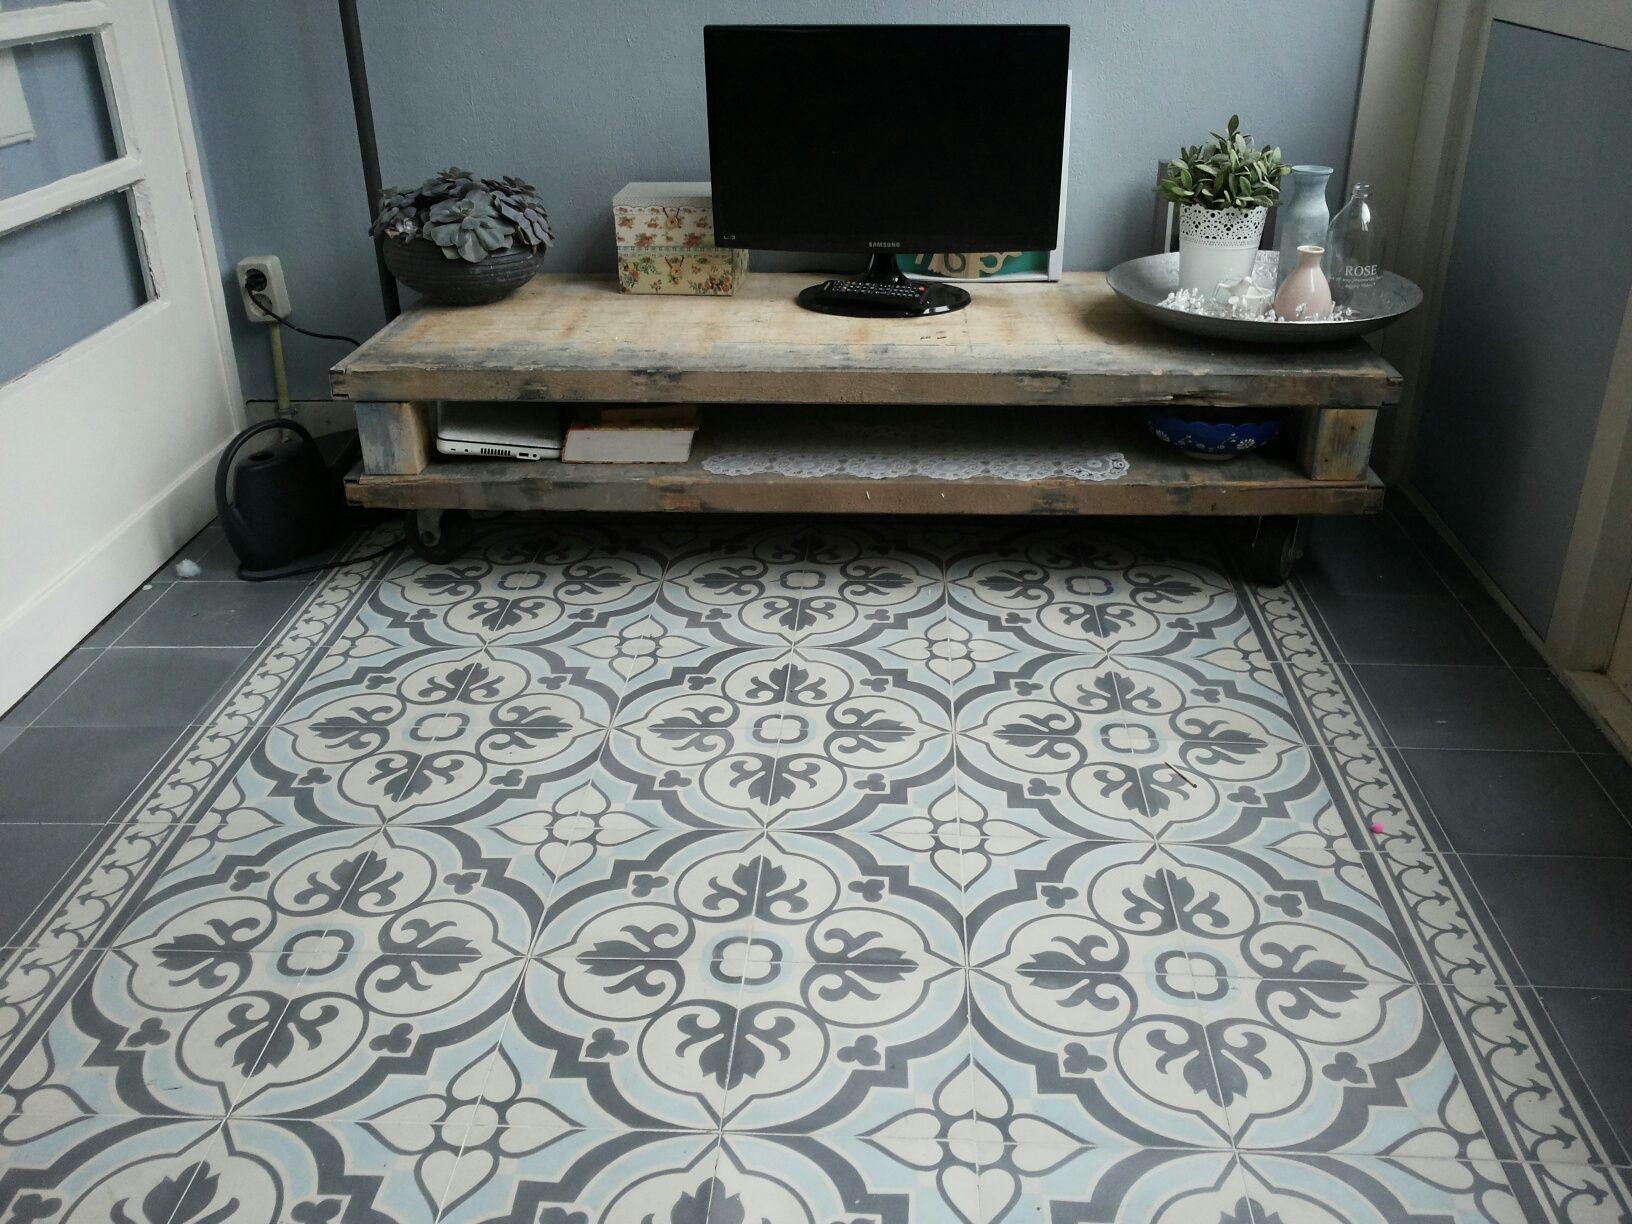 Vloerbedekking Met Motief : Portugese tegels flowerz 4 blue version product in beeld